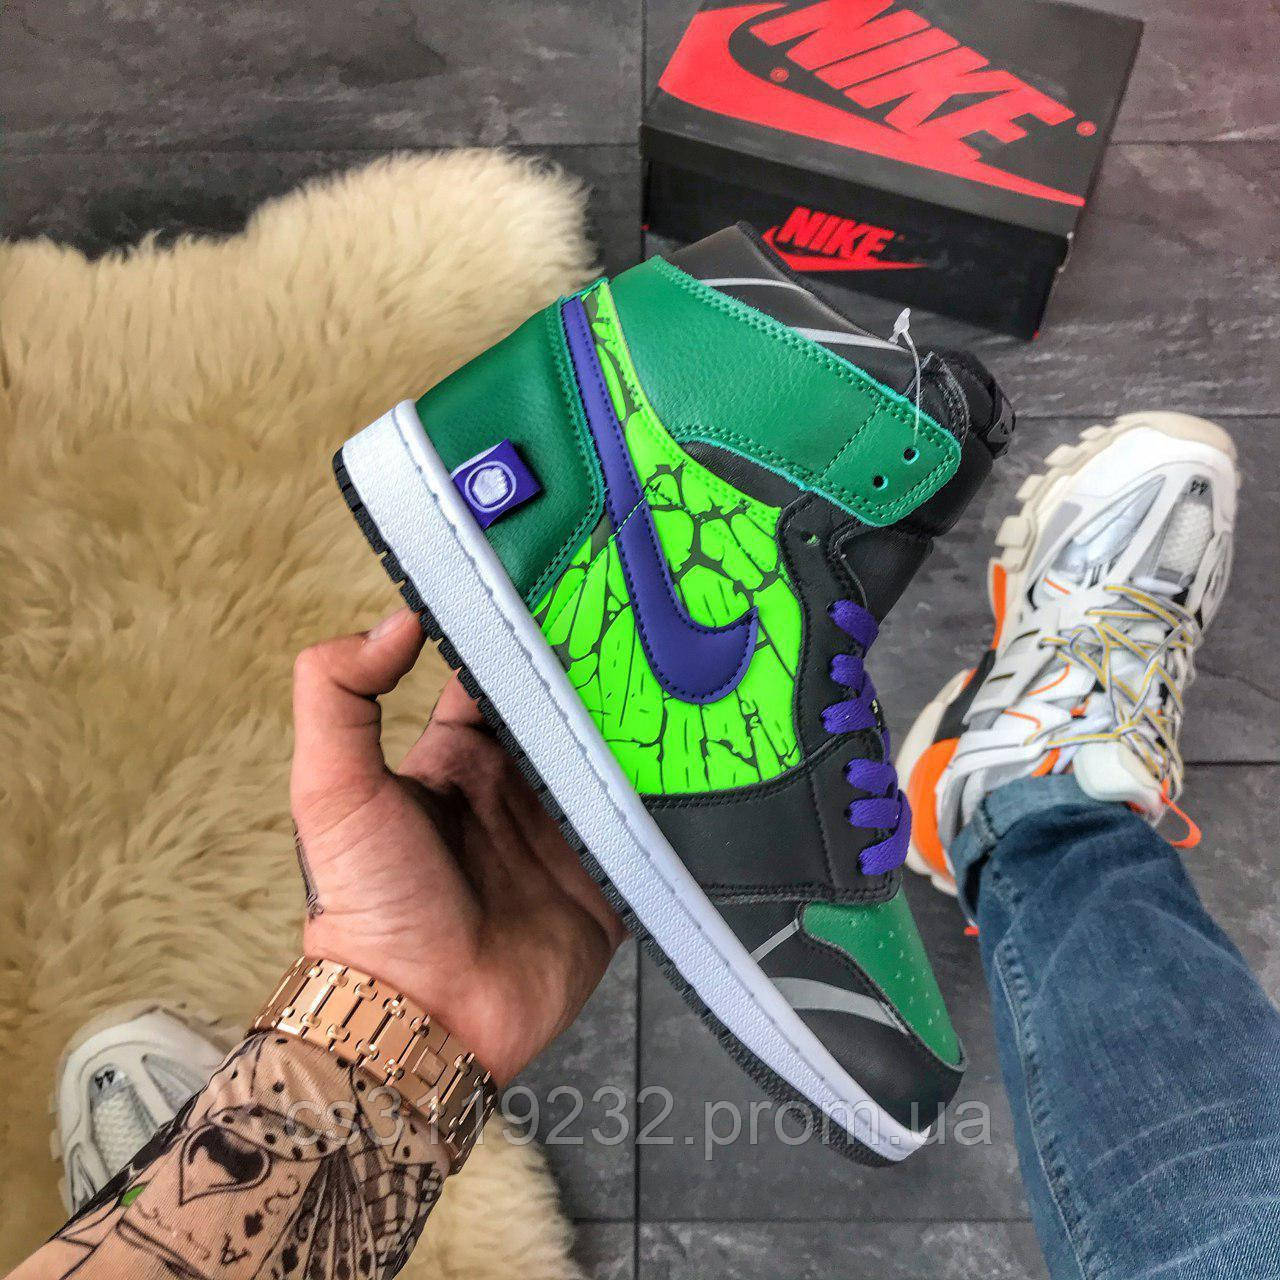 Мужские кроссовки Nike Air Jordan 1 High Green (зеленые)